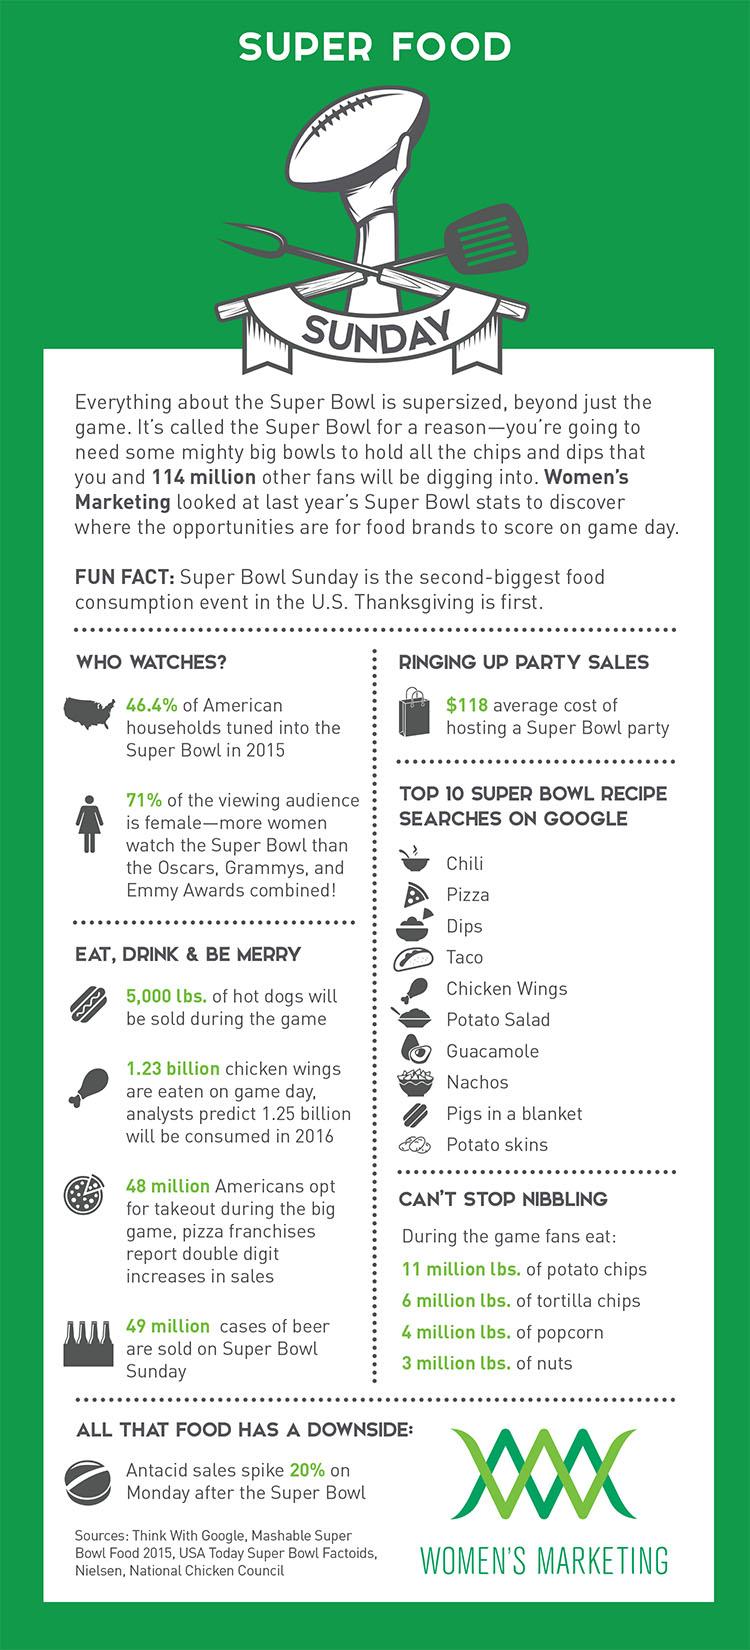 Superfood Sunday Infographic